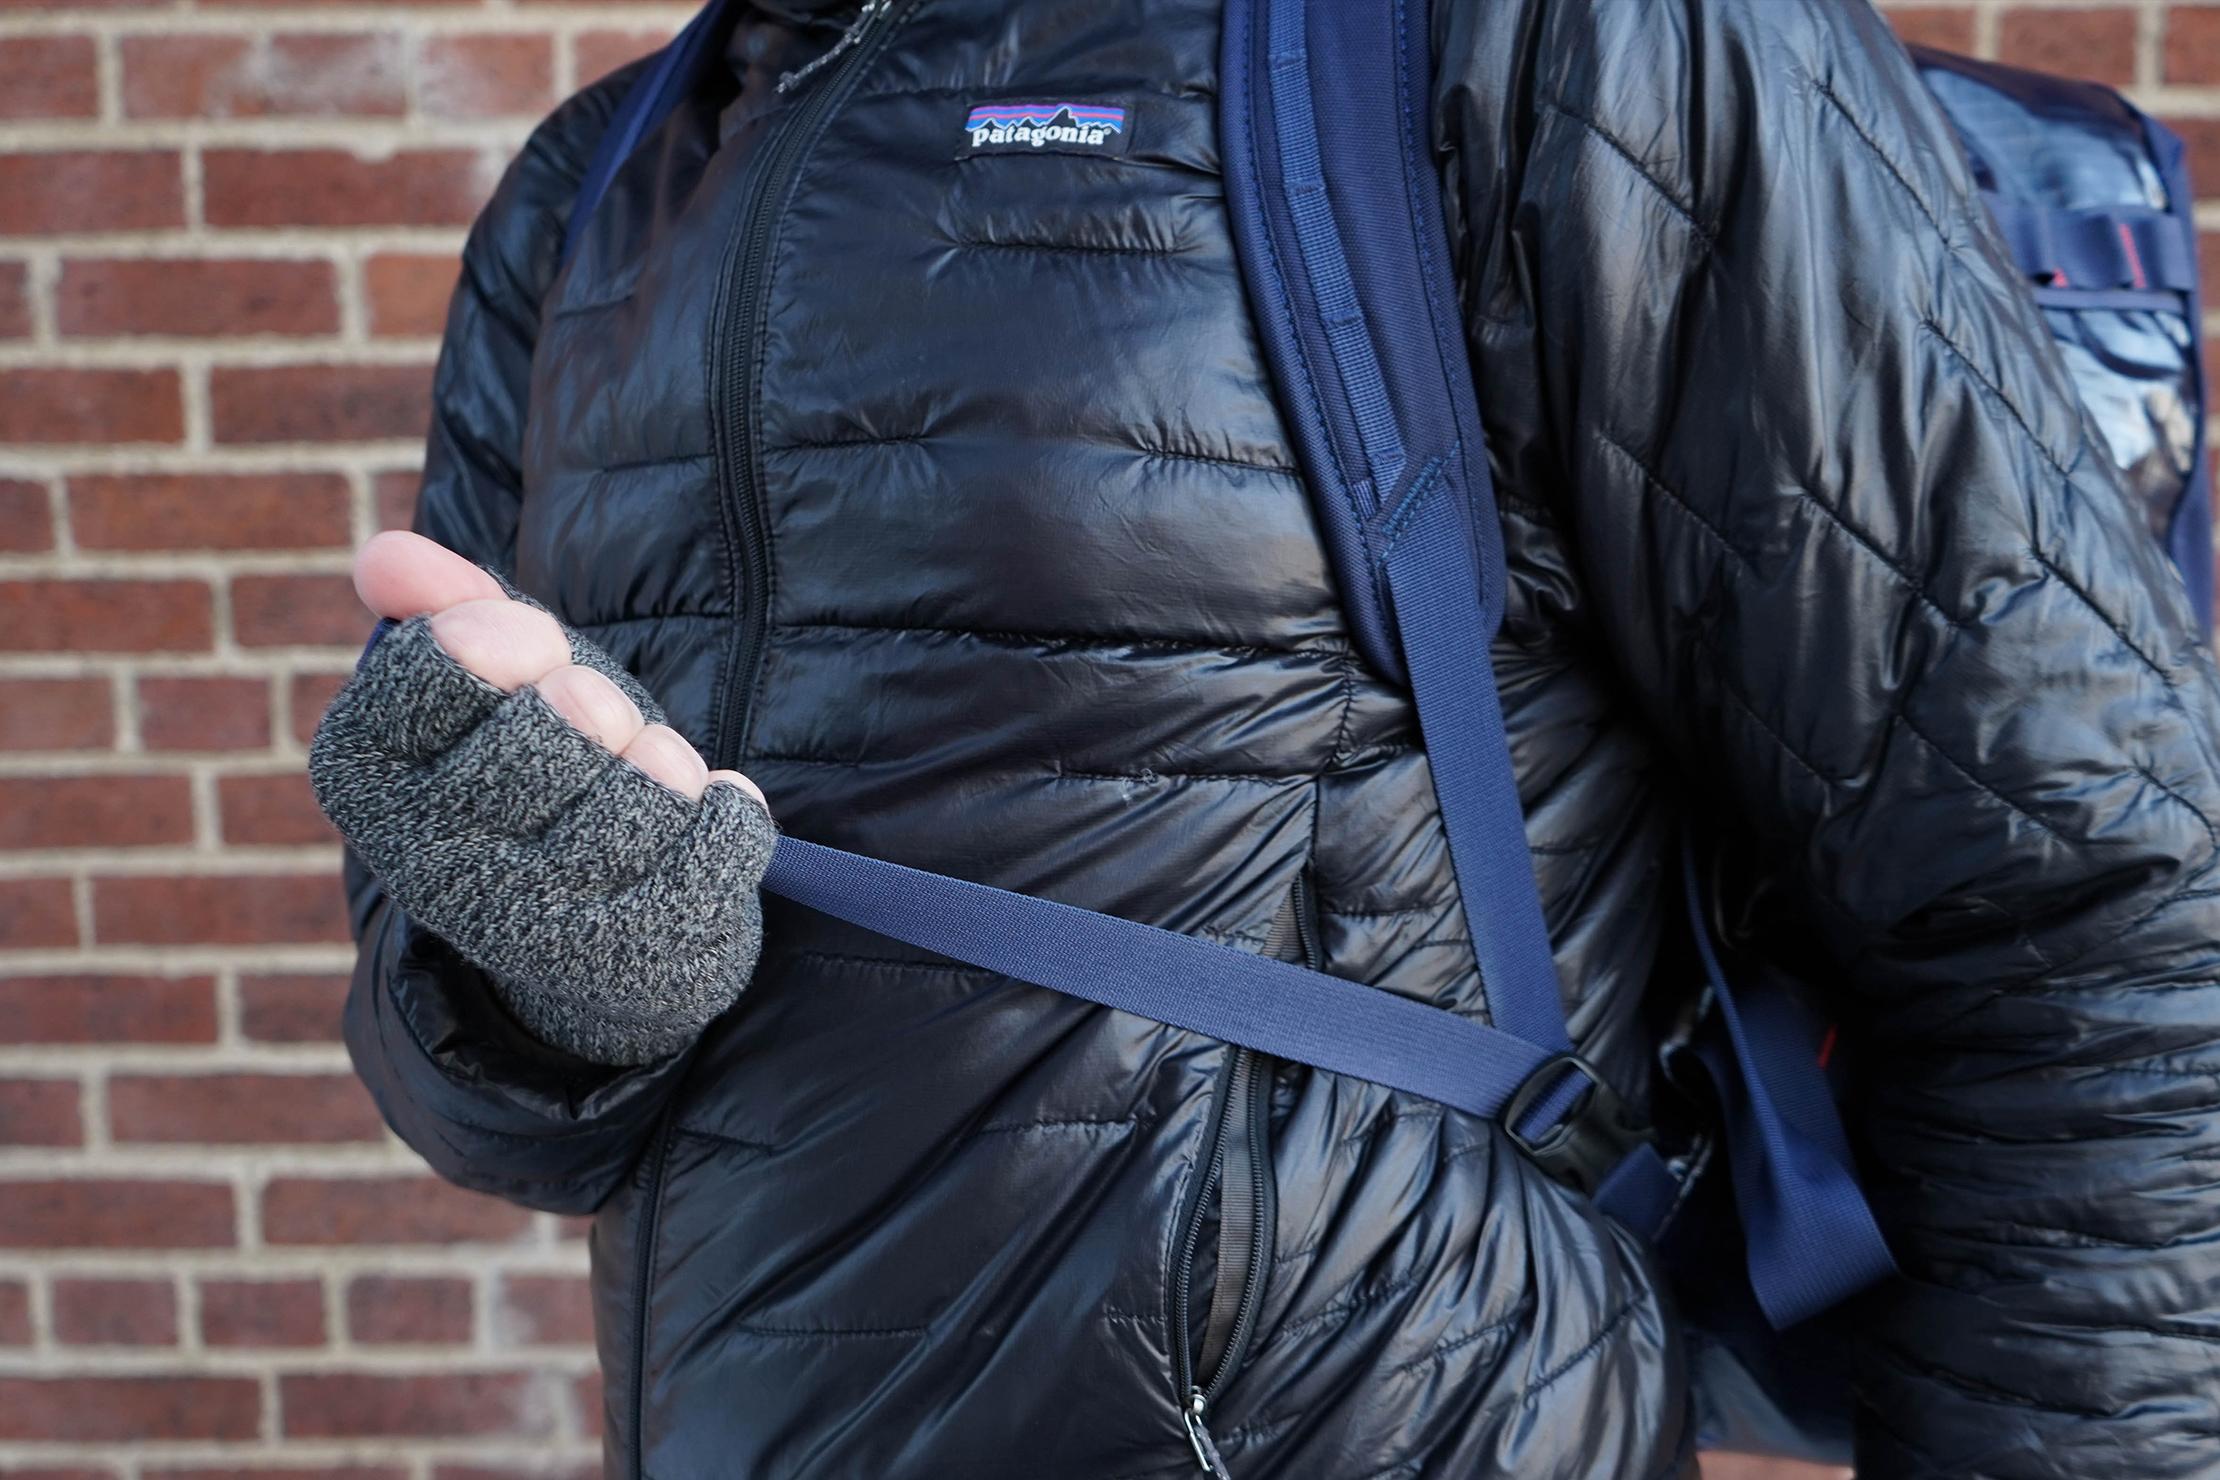 Patagonia Black Hole Duffel Bag 40L Shoulder Strap Adjustment